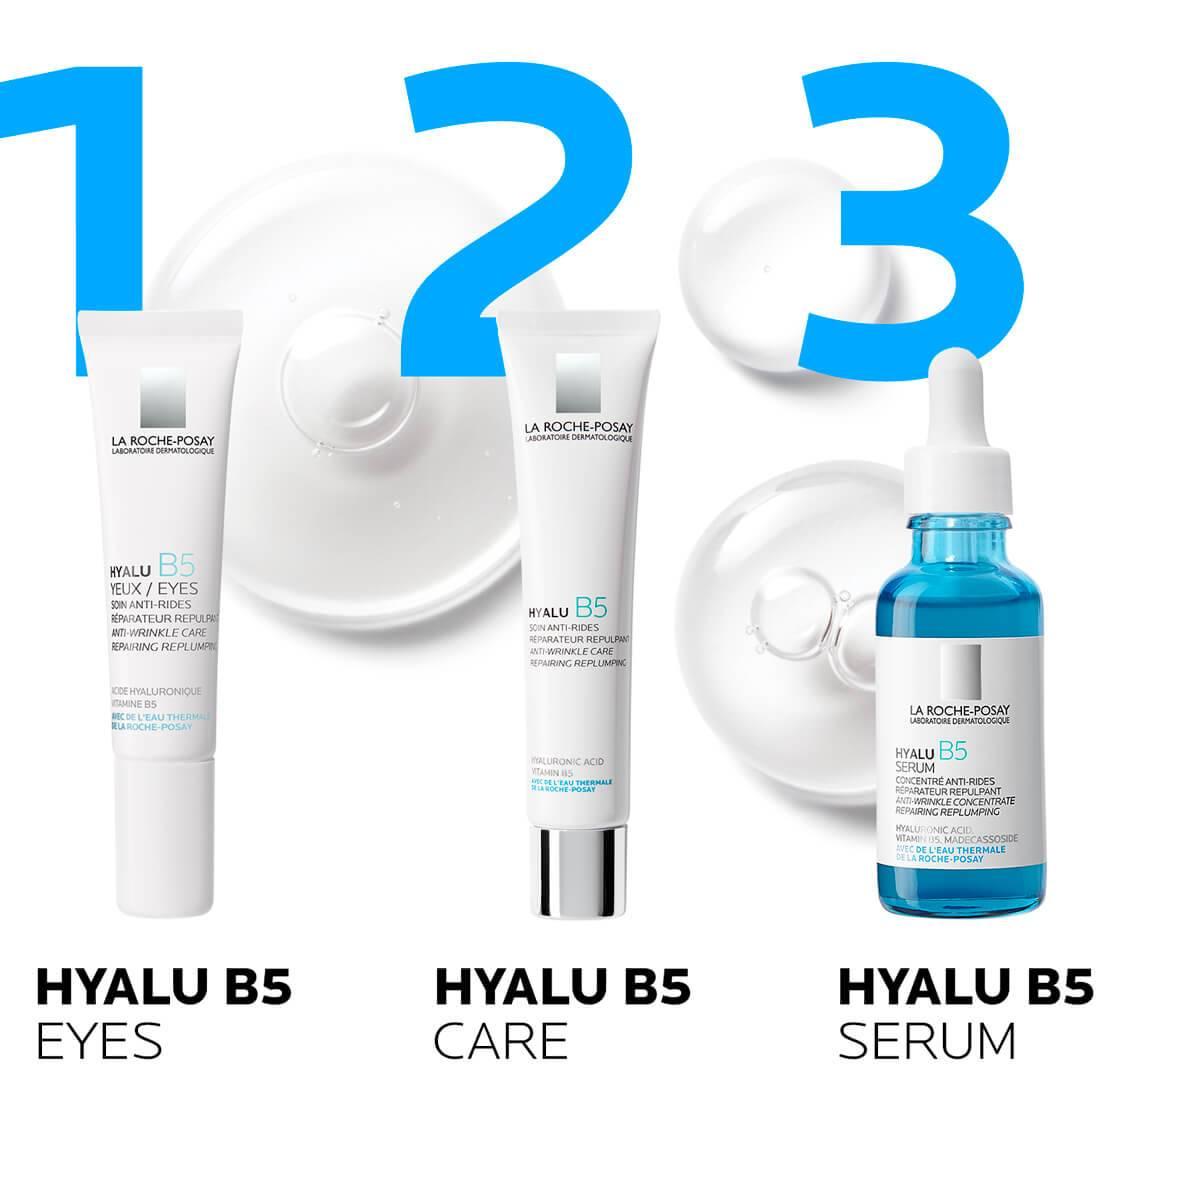 La Roche Posay ProduktSide Anti-Age Hyalu B5 Serum 30ml 333787558362 rutine